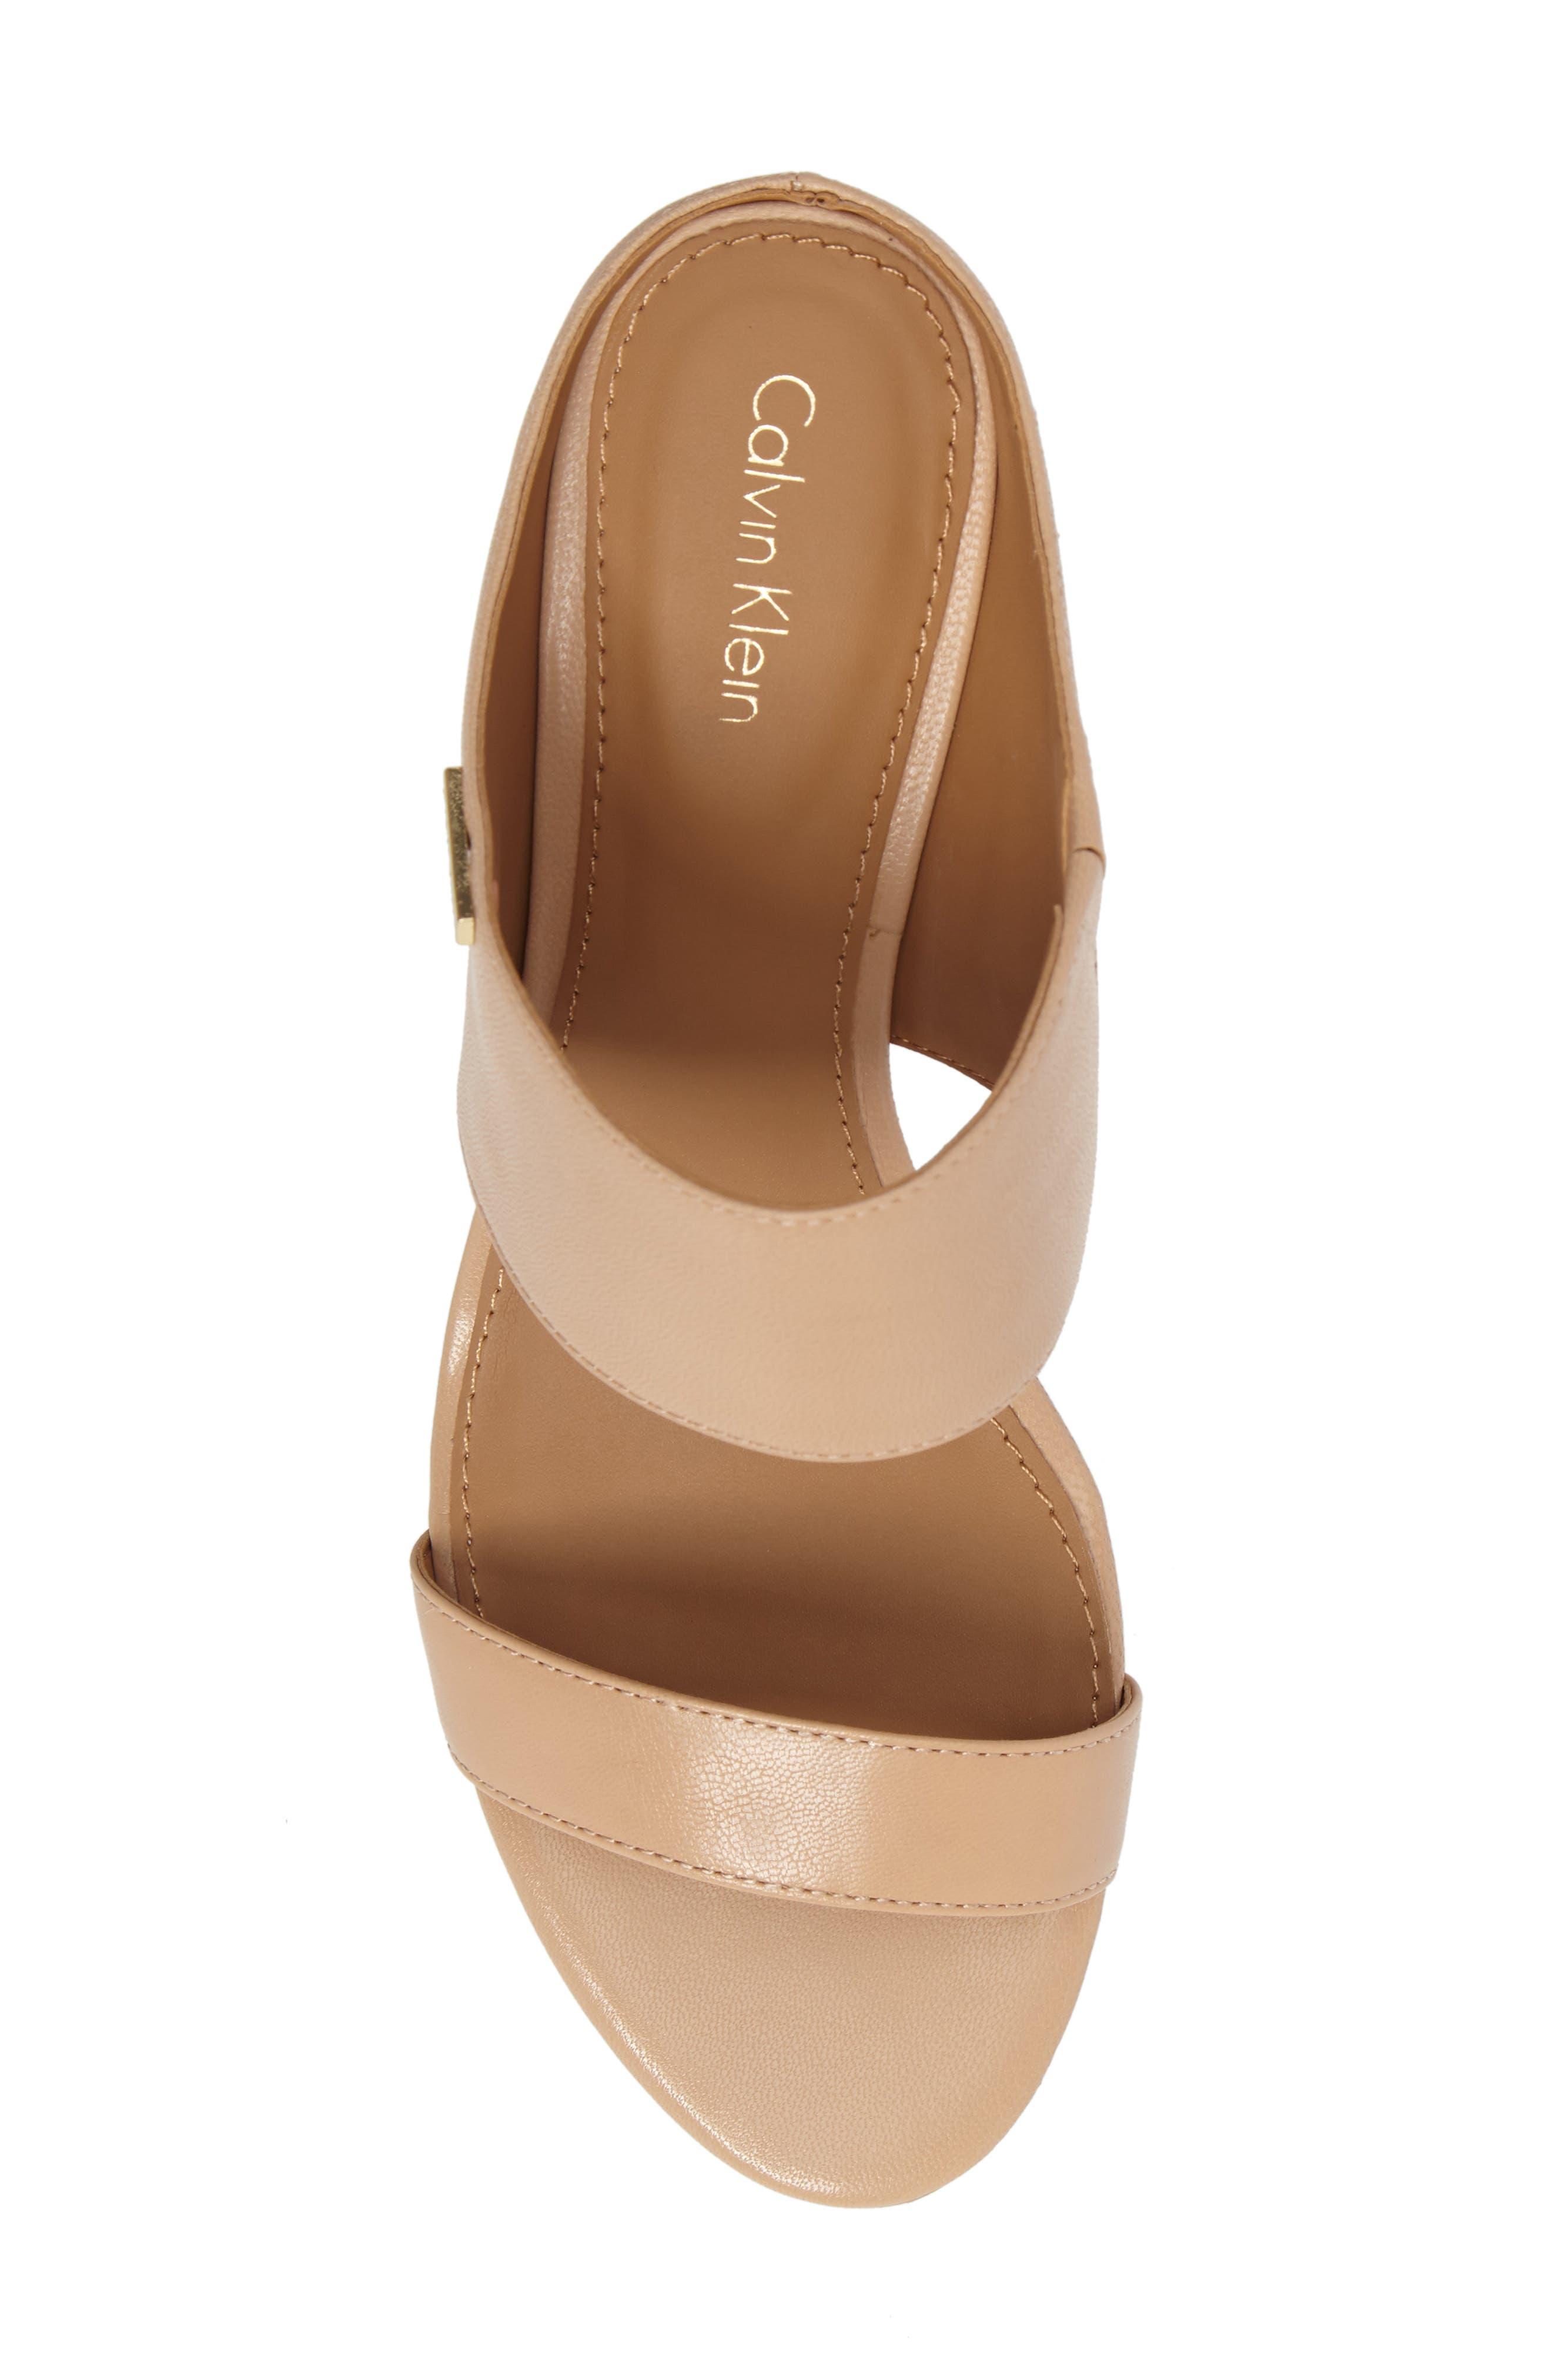 Phyllis Studded Wedge Sandal,                             Alternate thumbnail 20, color,